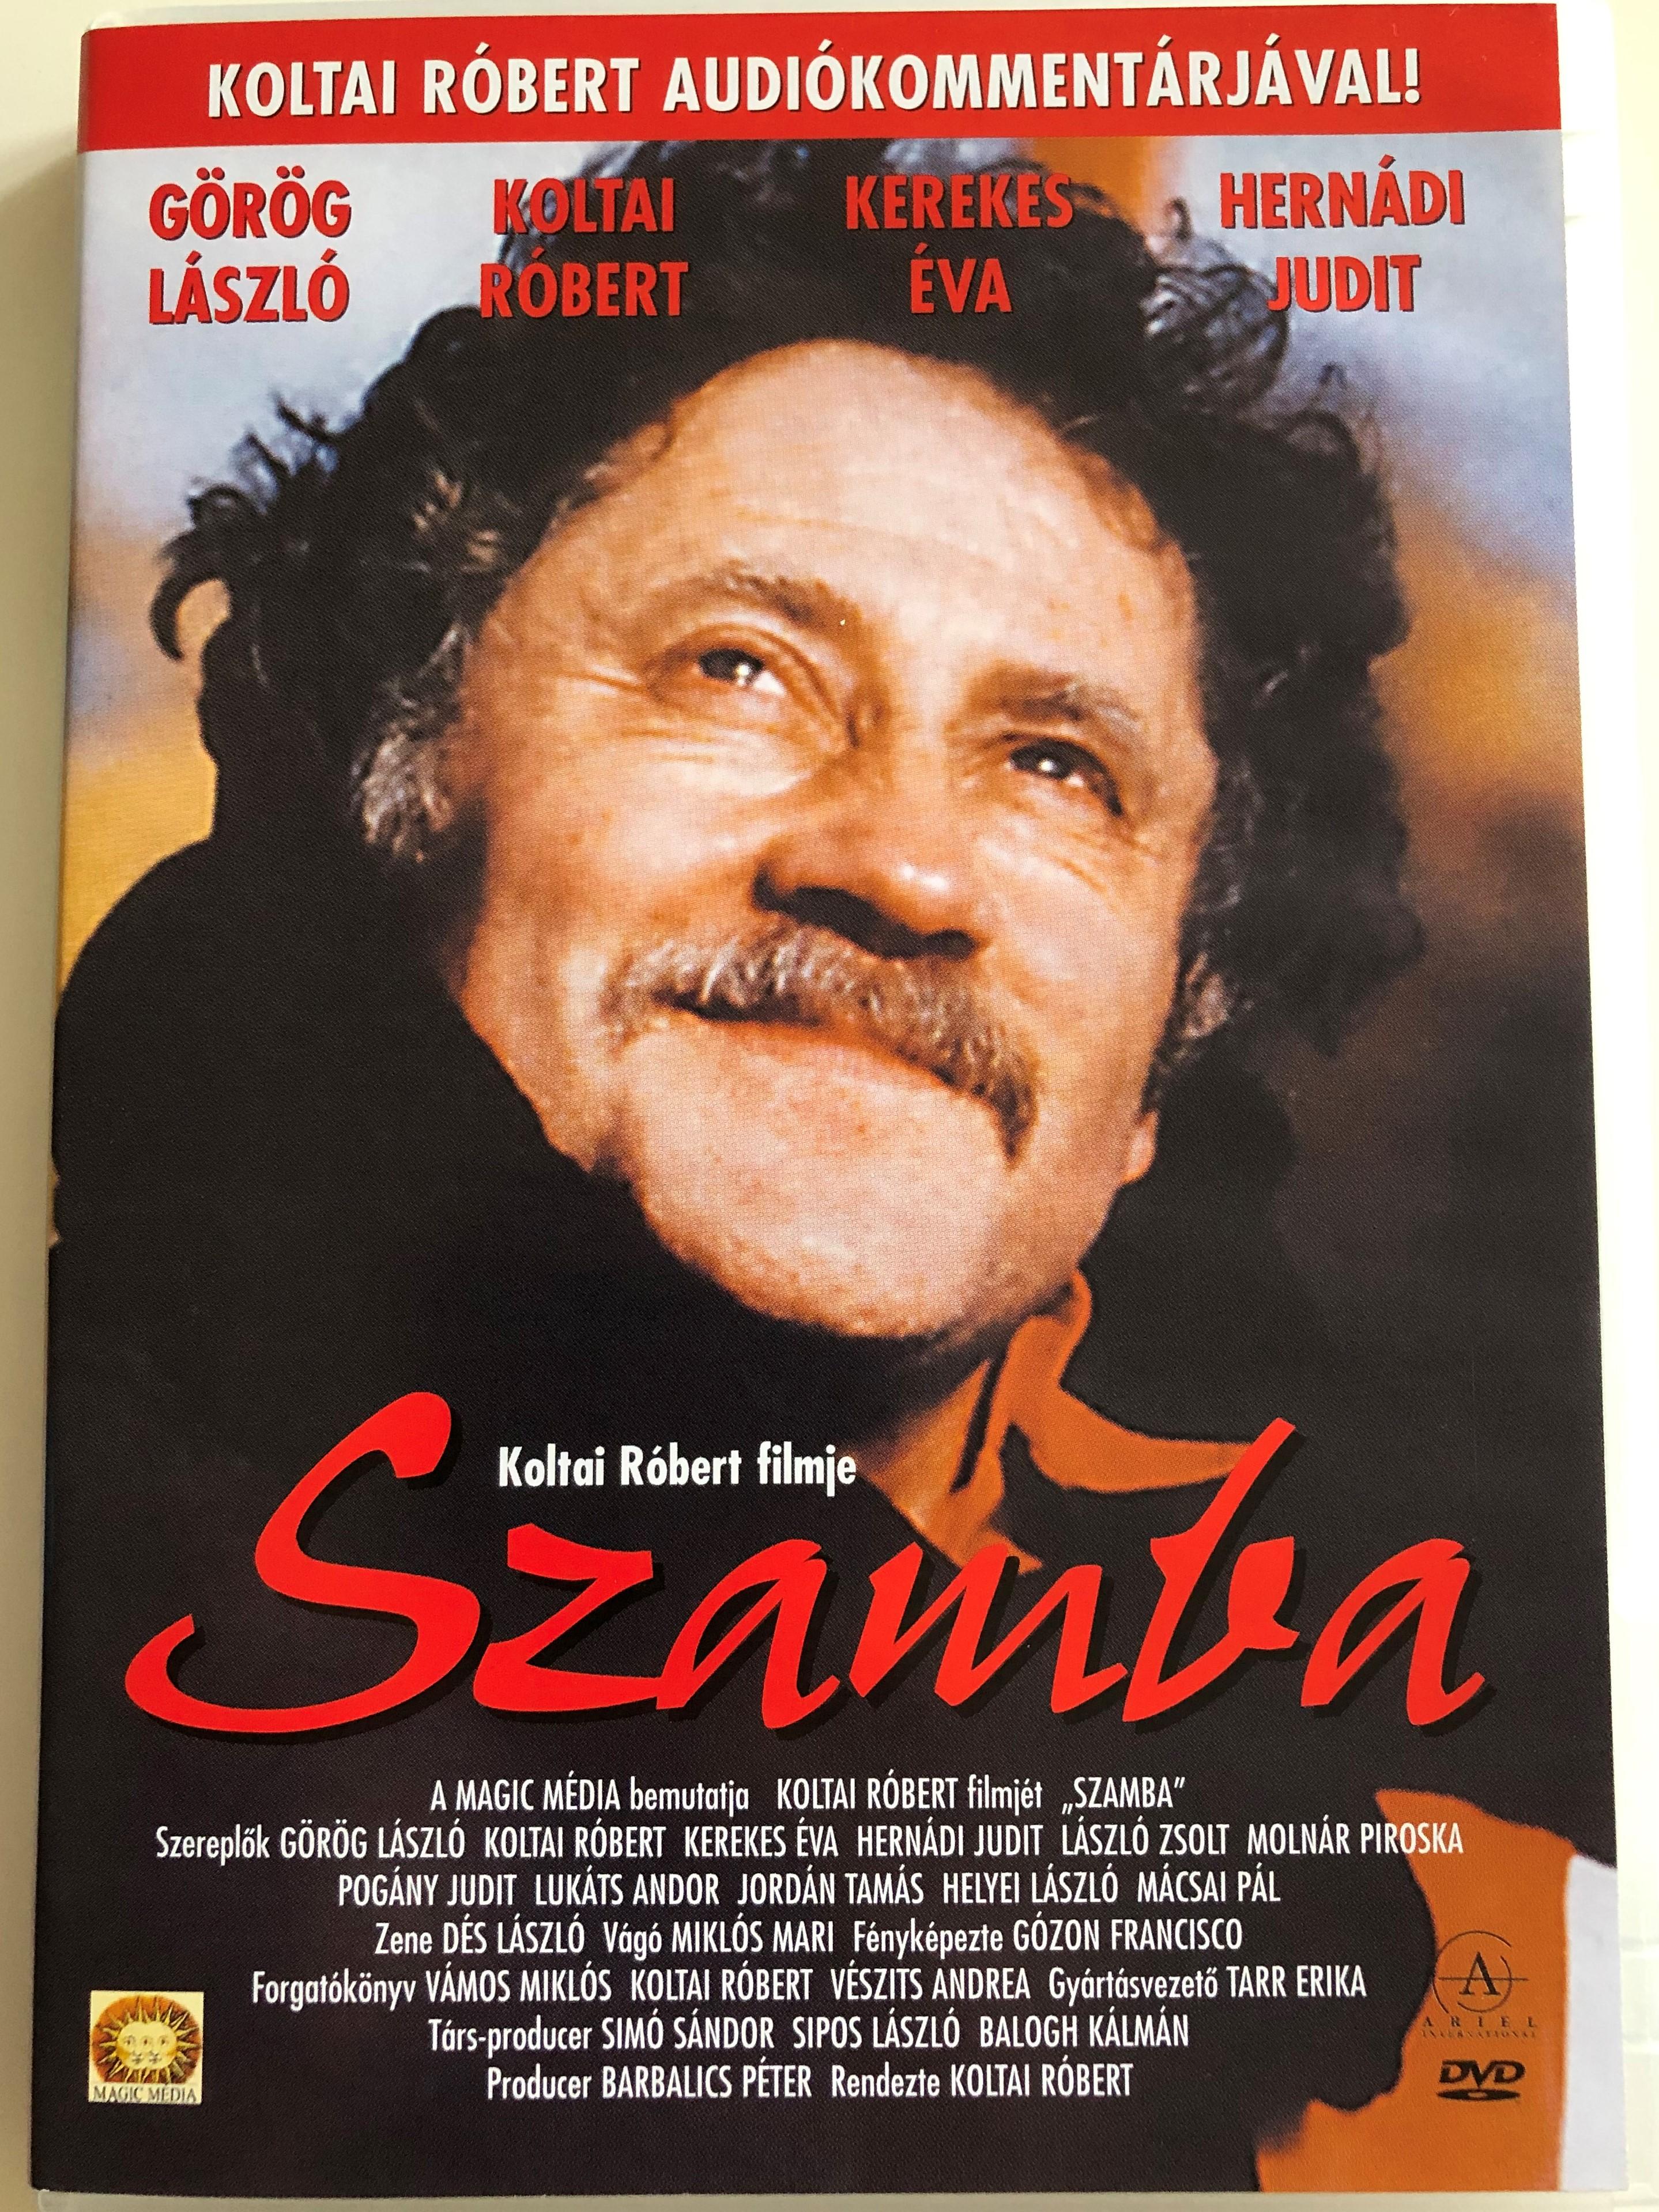 szamba-dvd-1996-directed-by-koltai-r-bert-starring-l-szl-g-r-g-r-bert-koltai-hungarian-comedy-film-1-.jpg